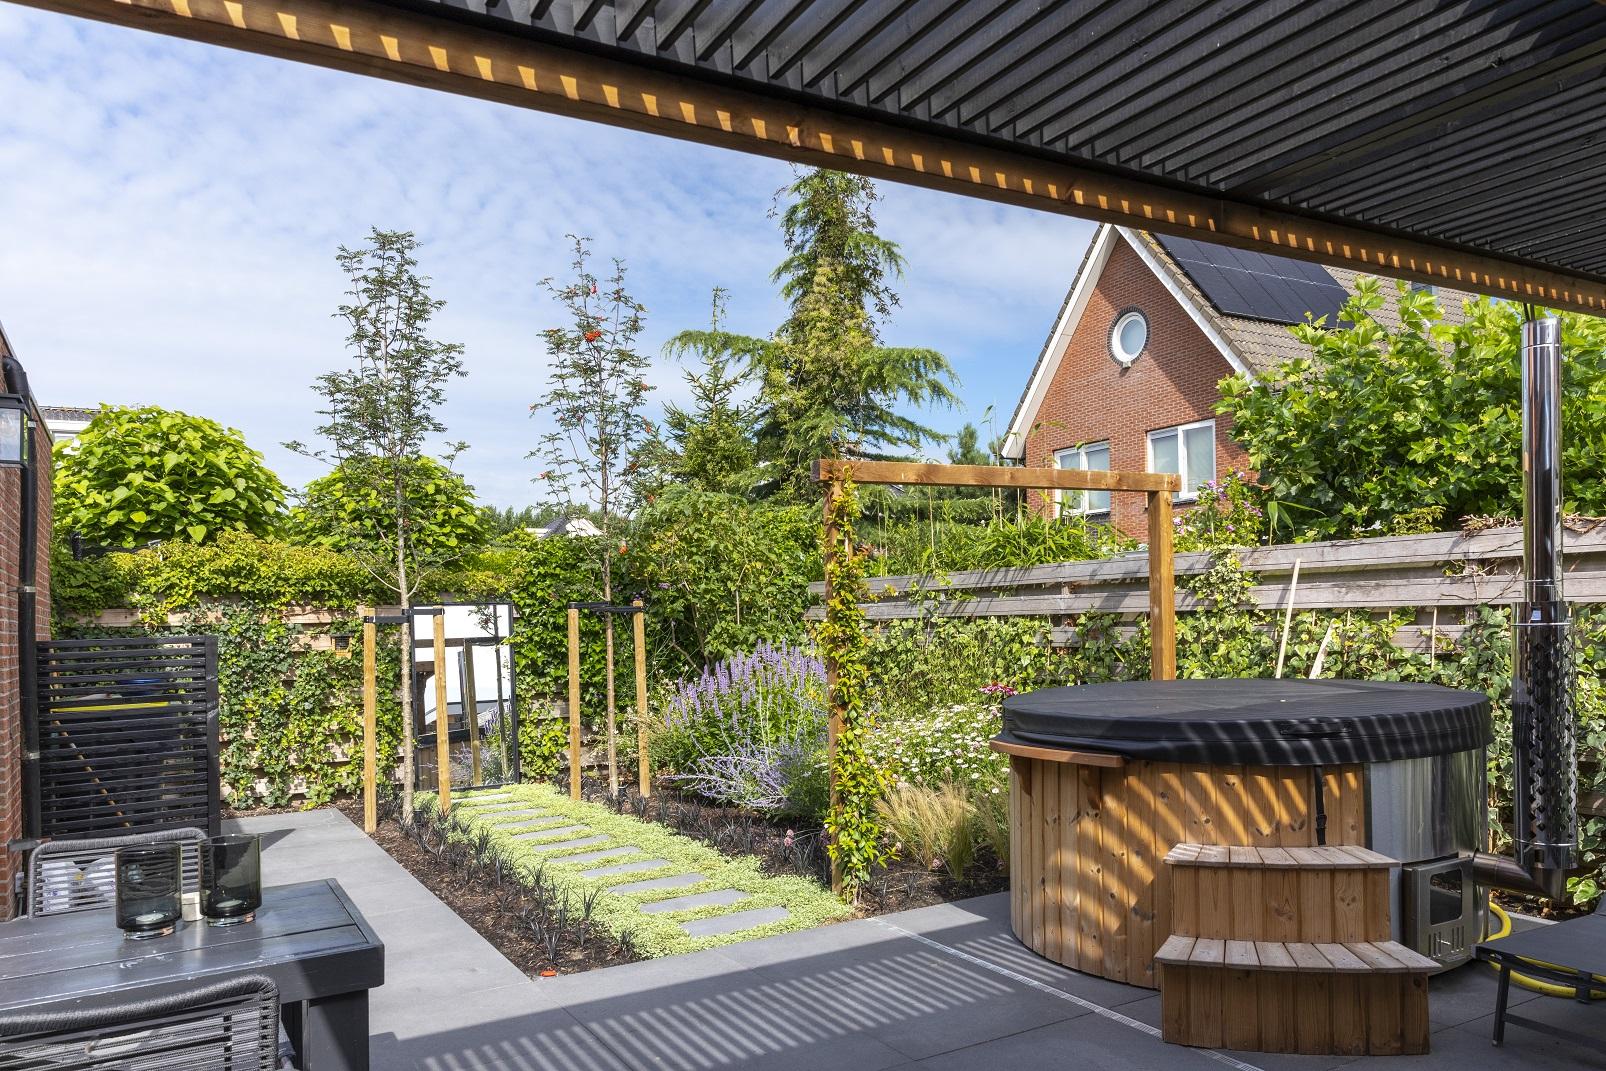 Tuinaanleg tuinontwerp Numansdorp Van der Waal tuinen hovenier Piershil